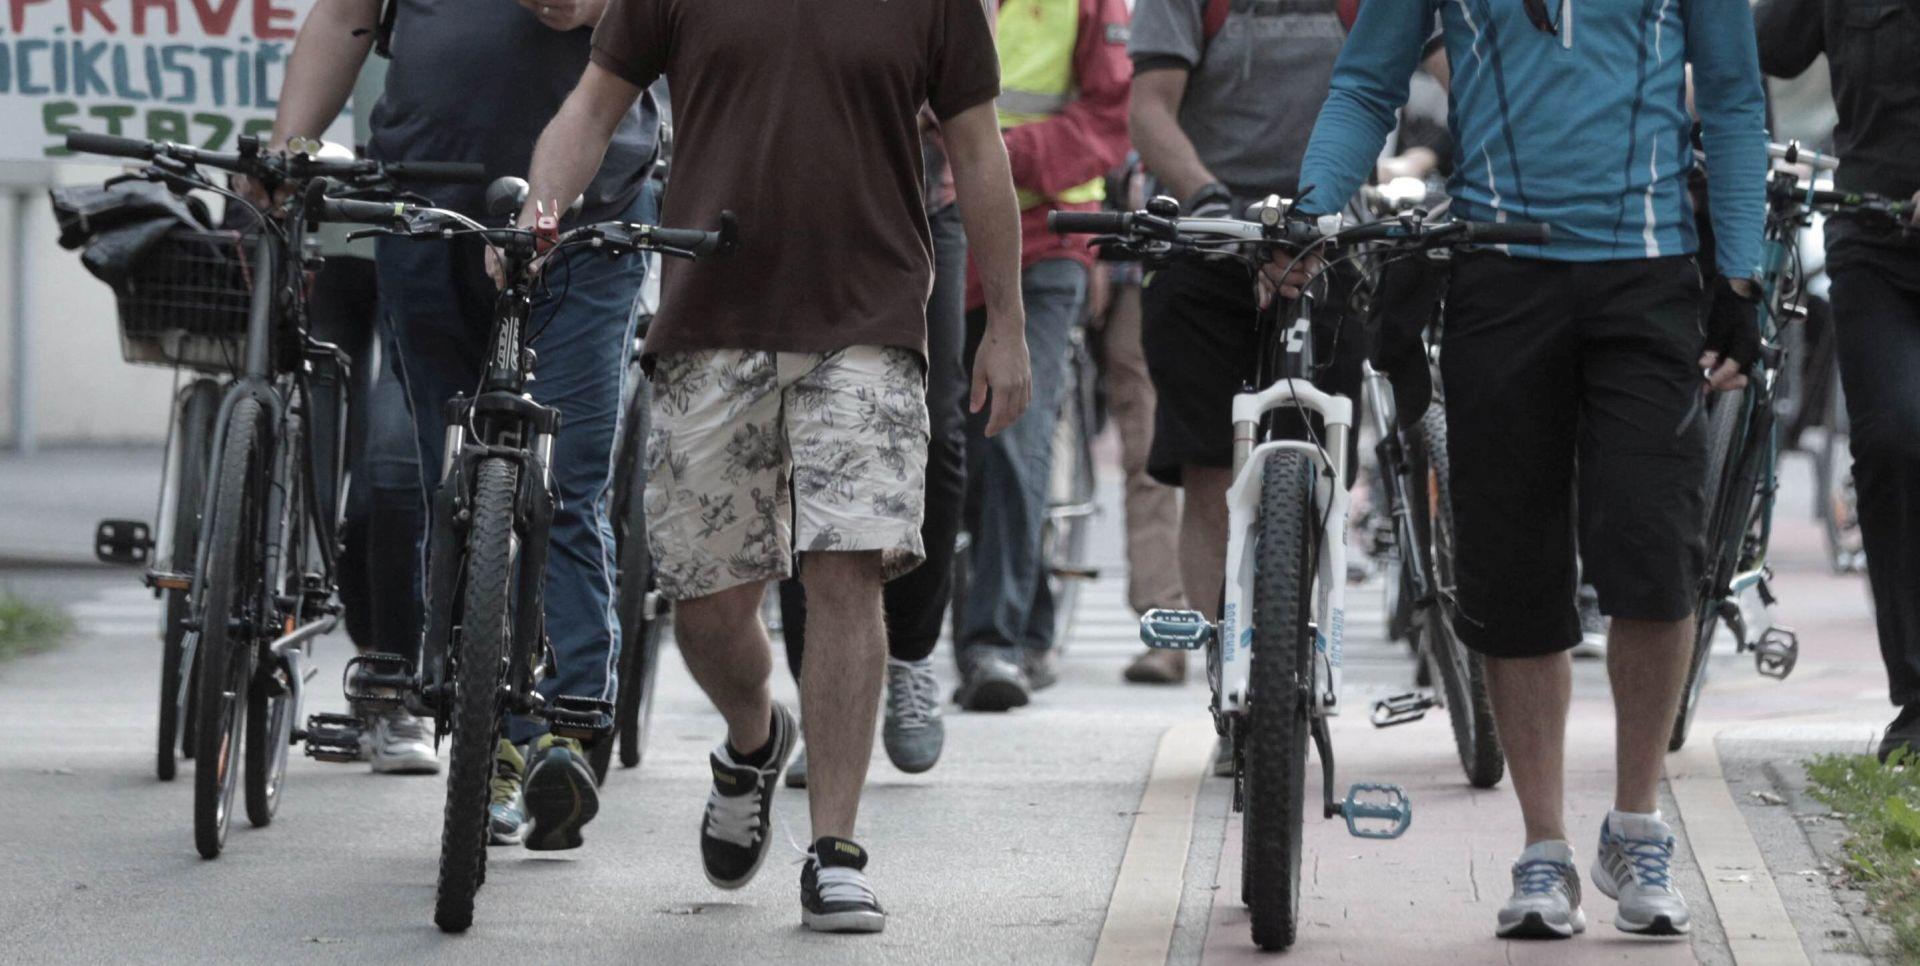 'NI KRIV, A DUŽAN' Prosvjed zagrebačkih biciklista